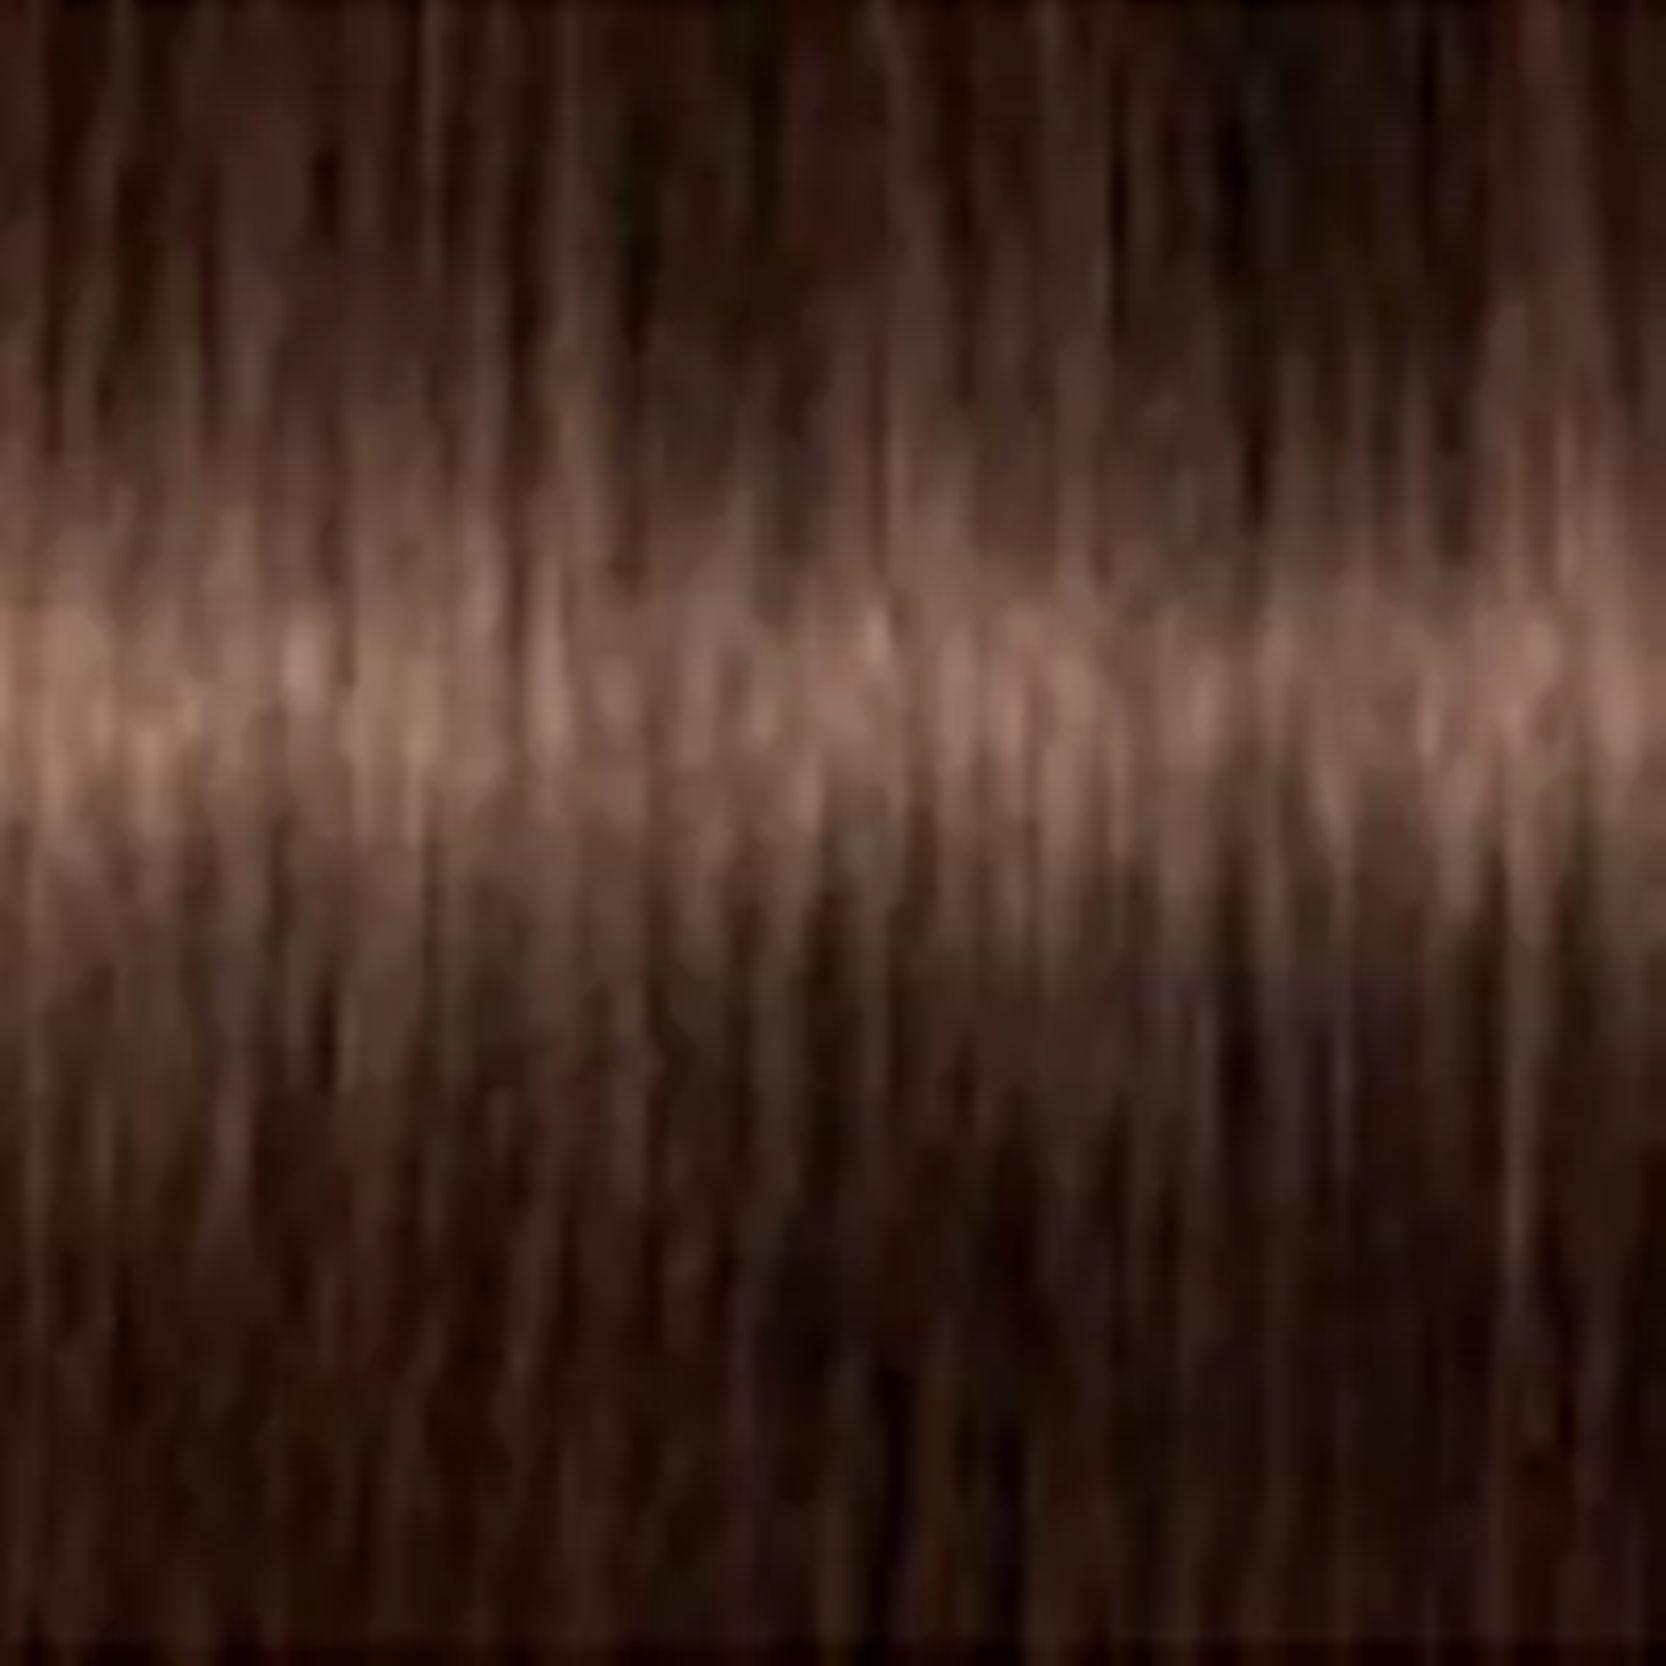 Tinta Igora Royal 60g - Cor 5.57 - Castanho Claro Dourado Cobre